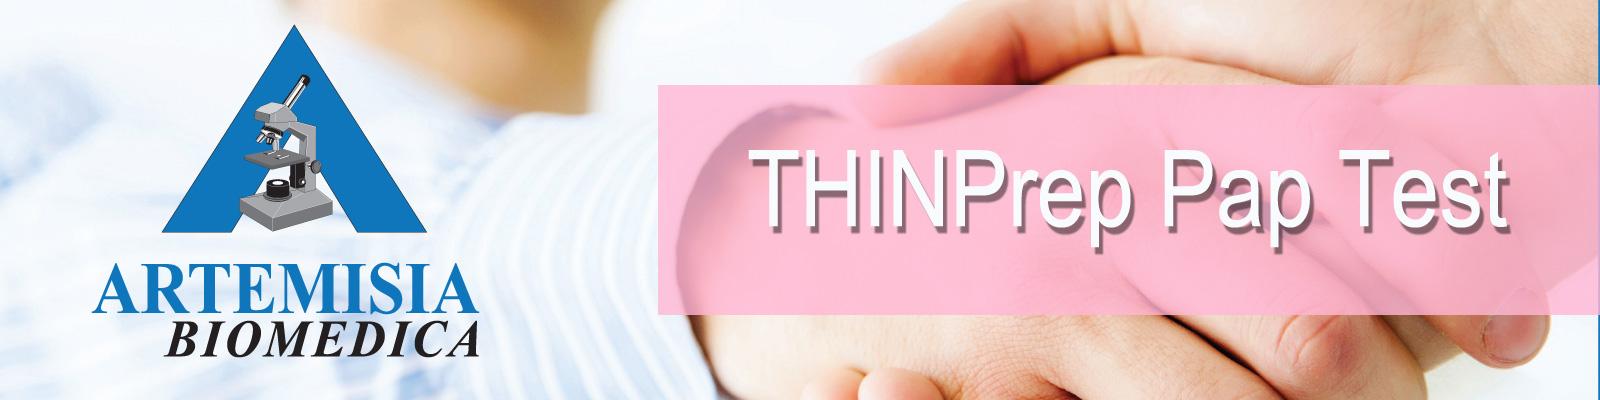 THINPrep Pap Test